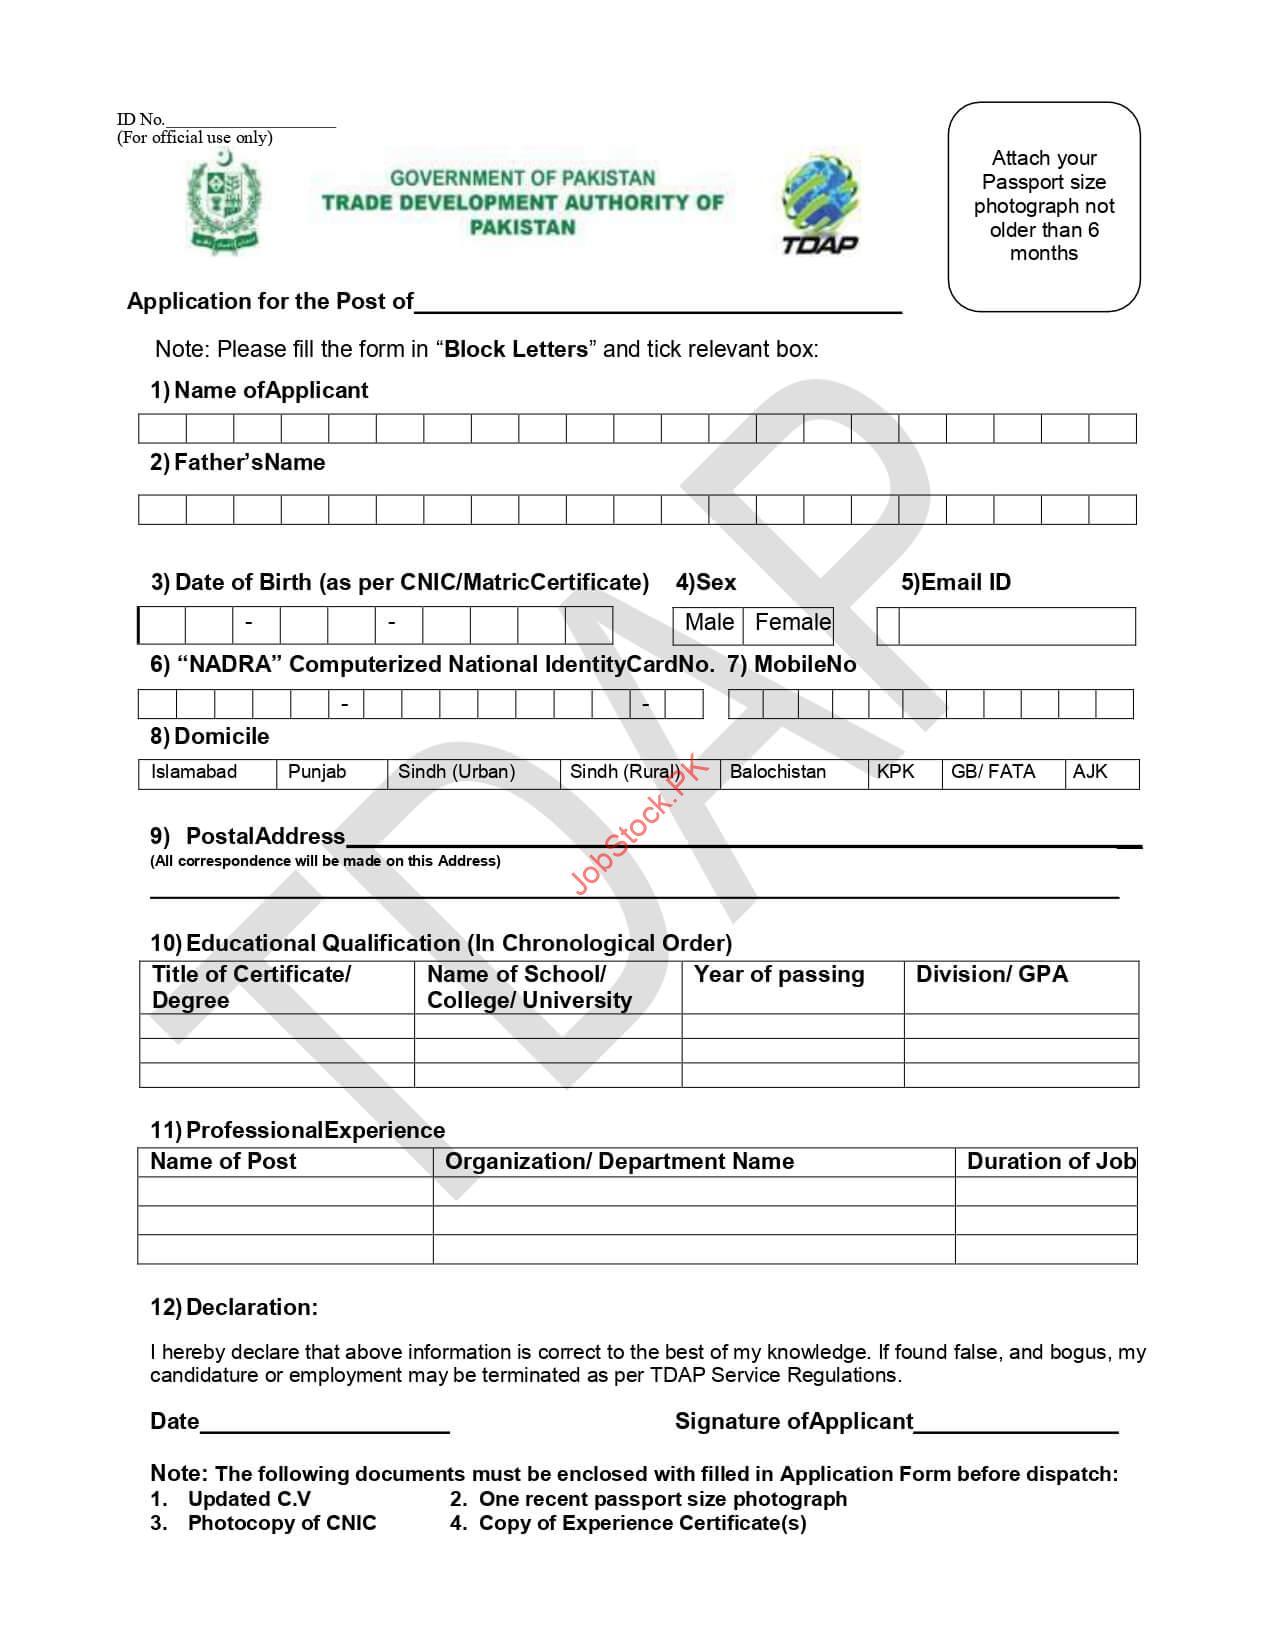 Latest Tdip Trade Development Authority Of Pakistan Application Form